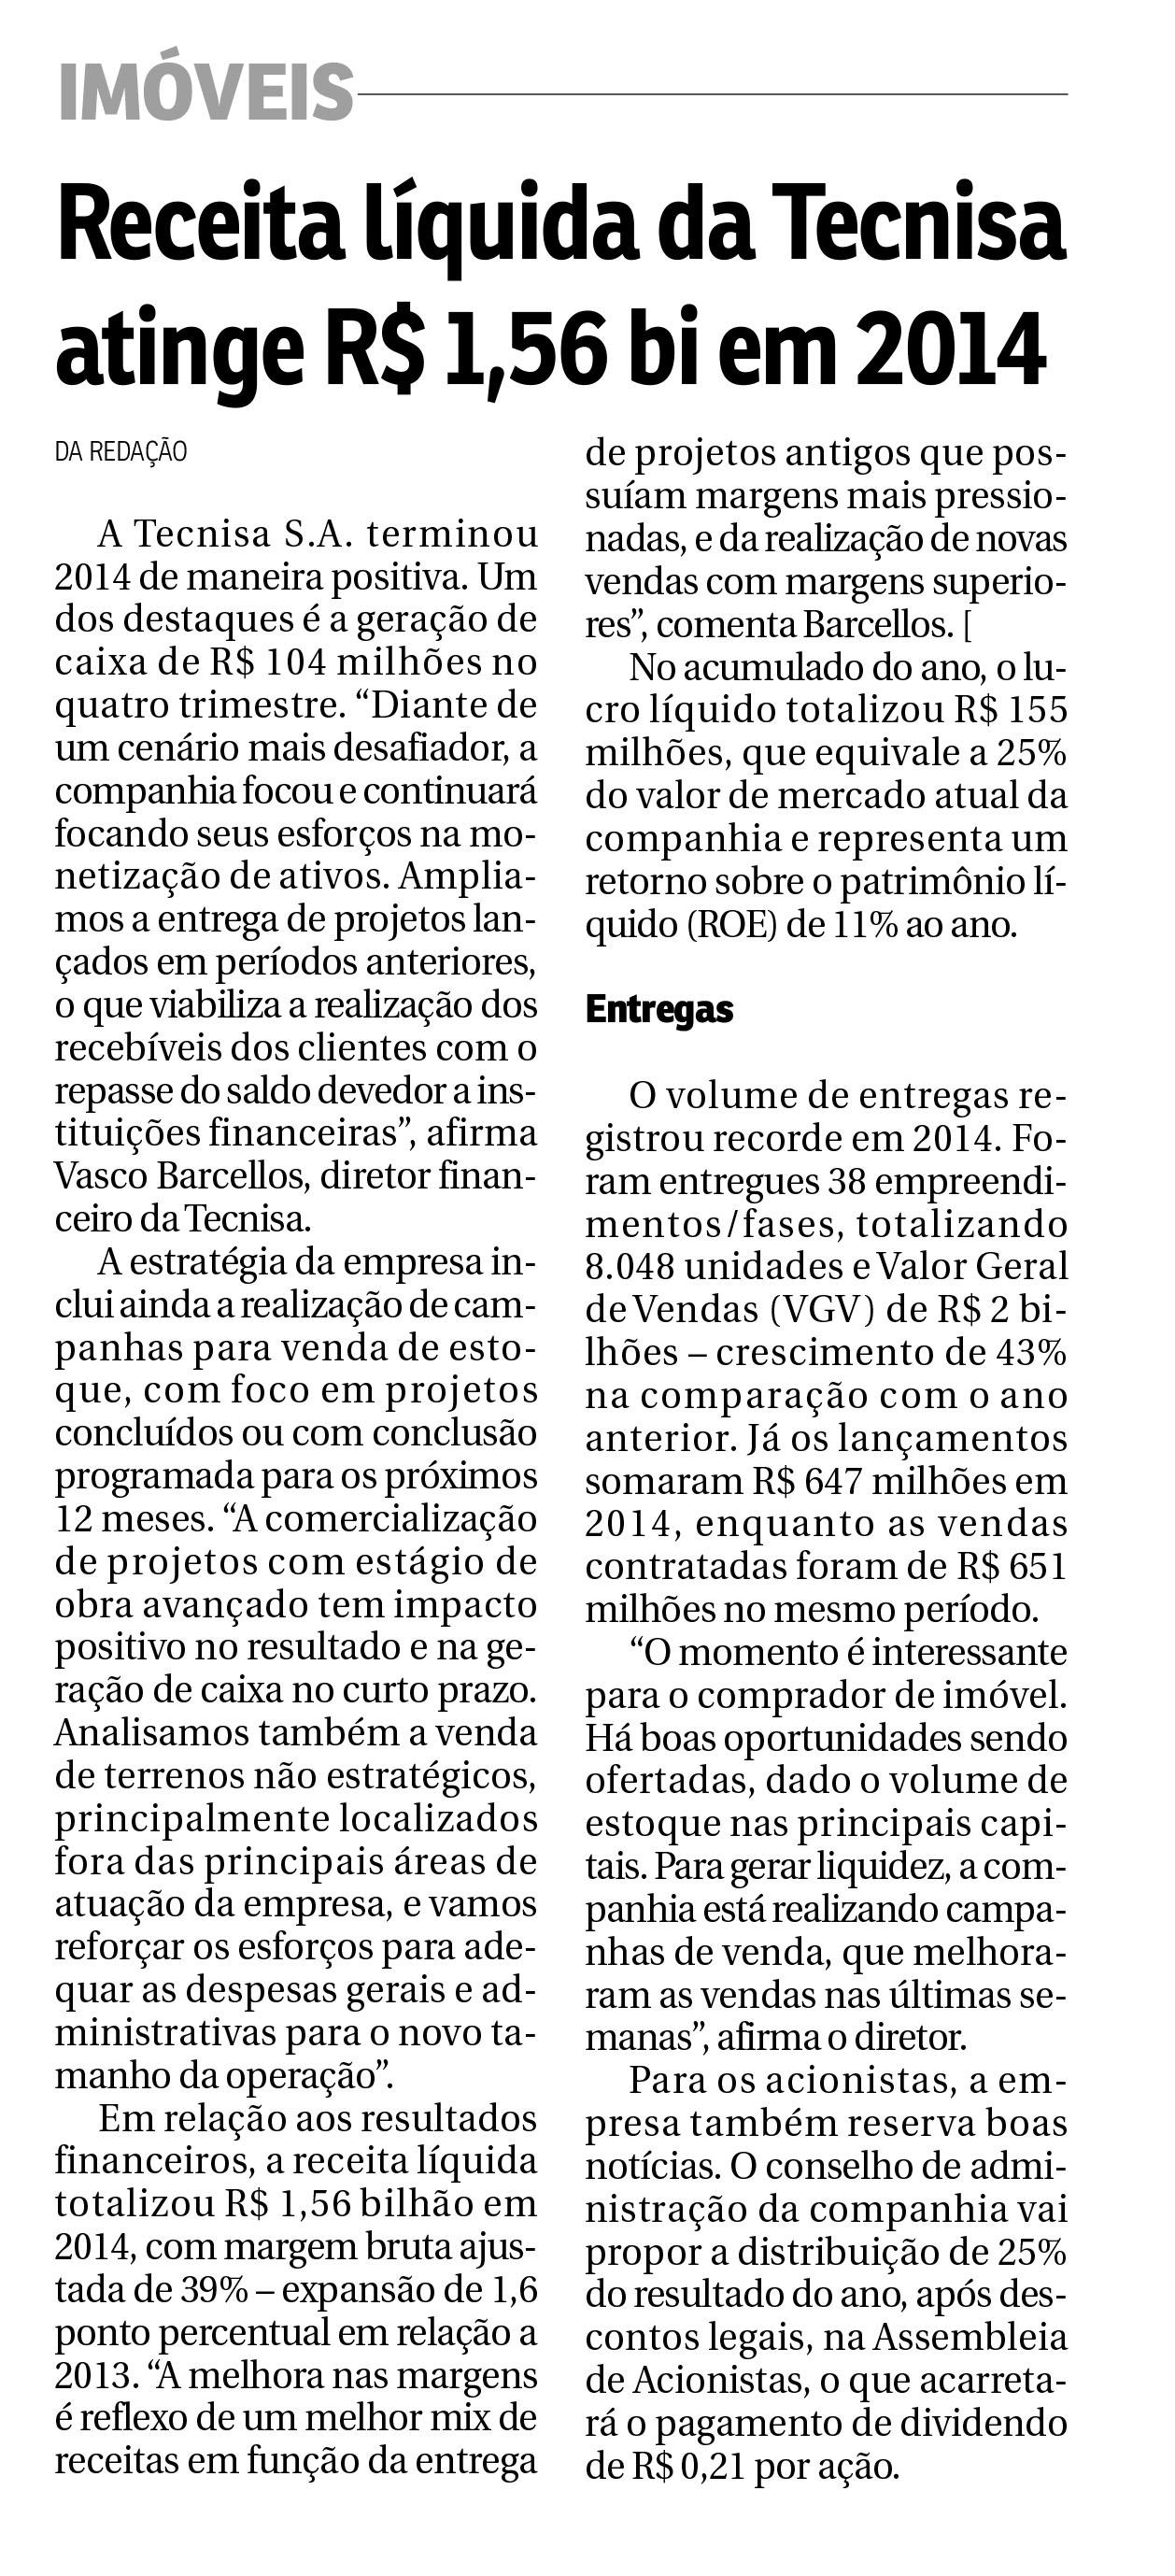 Receita líquida da Tecnisa atinge R$ 1,56 bi em 2014